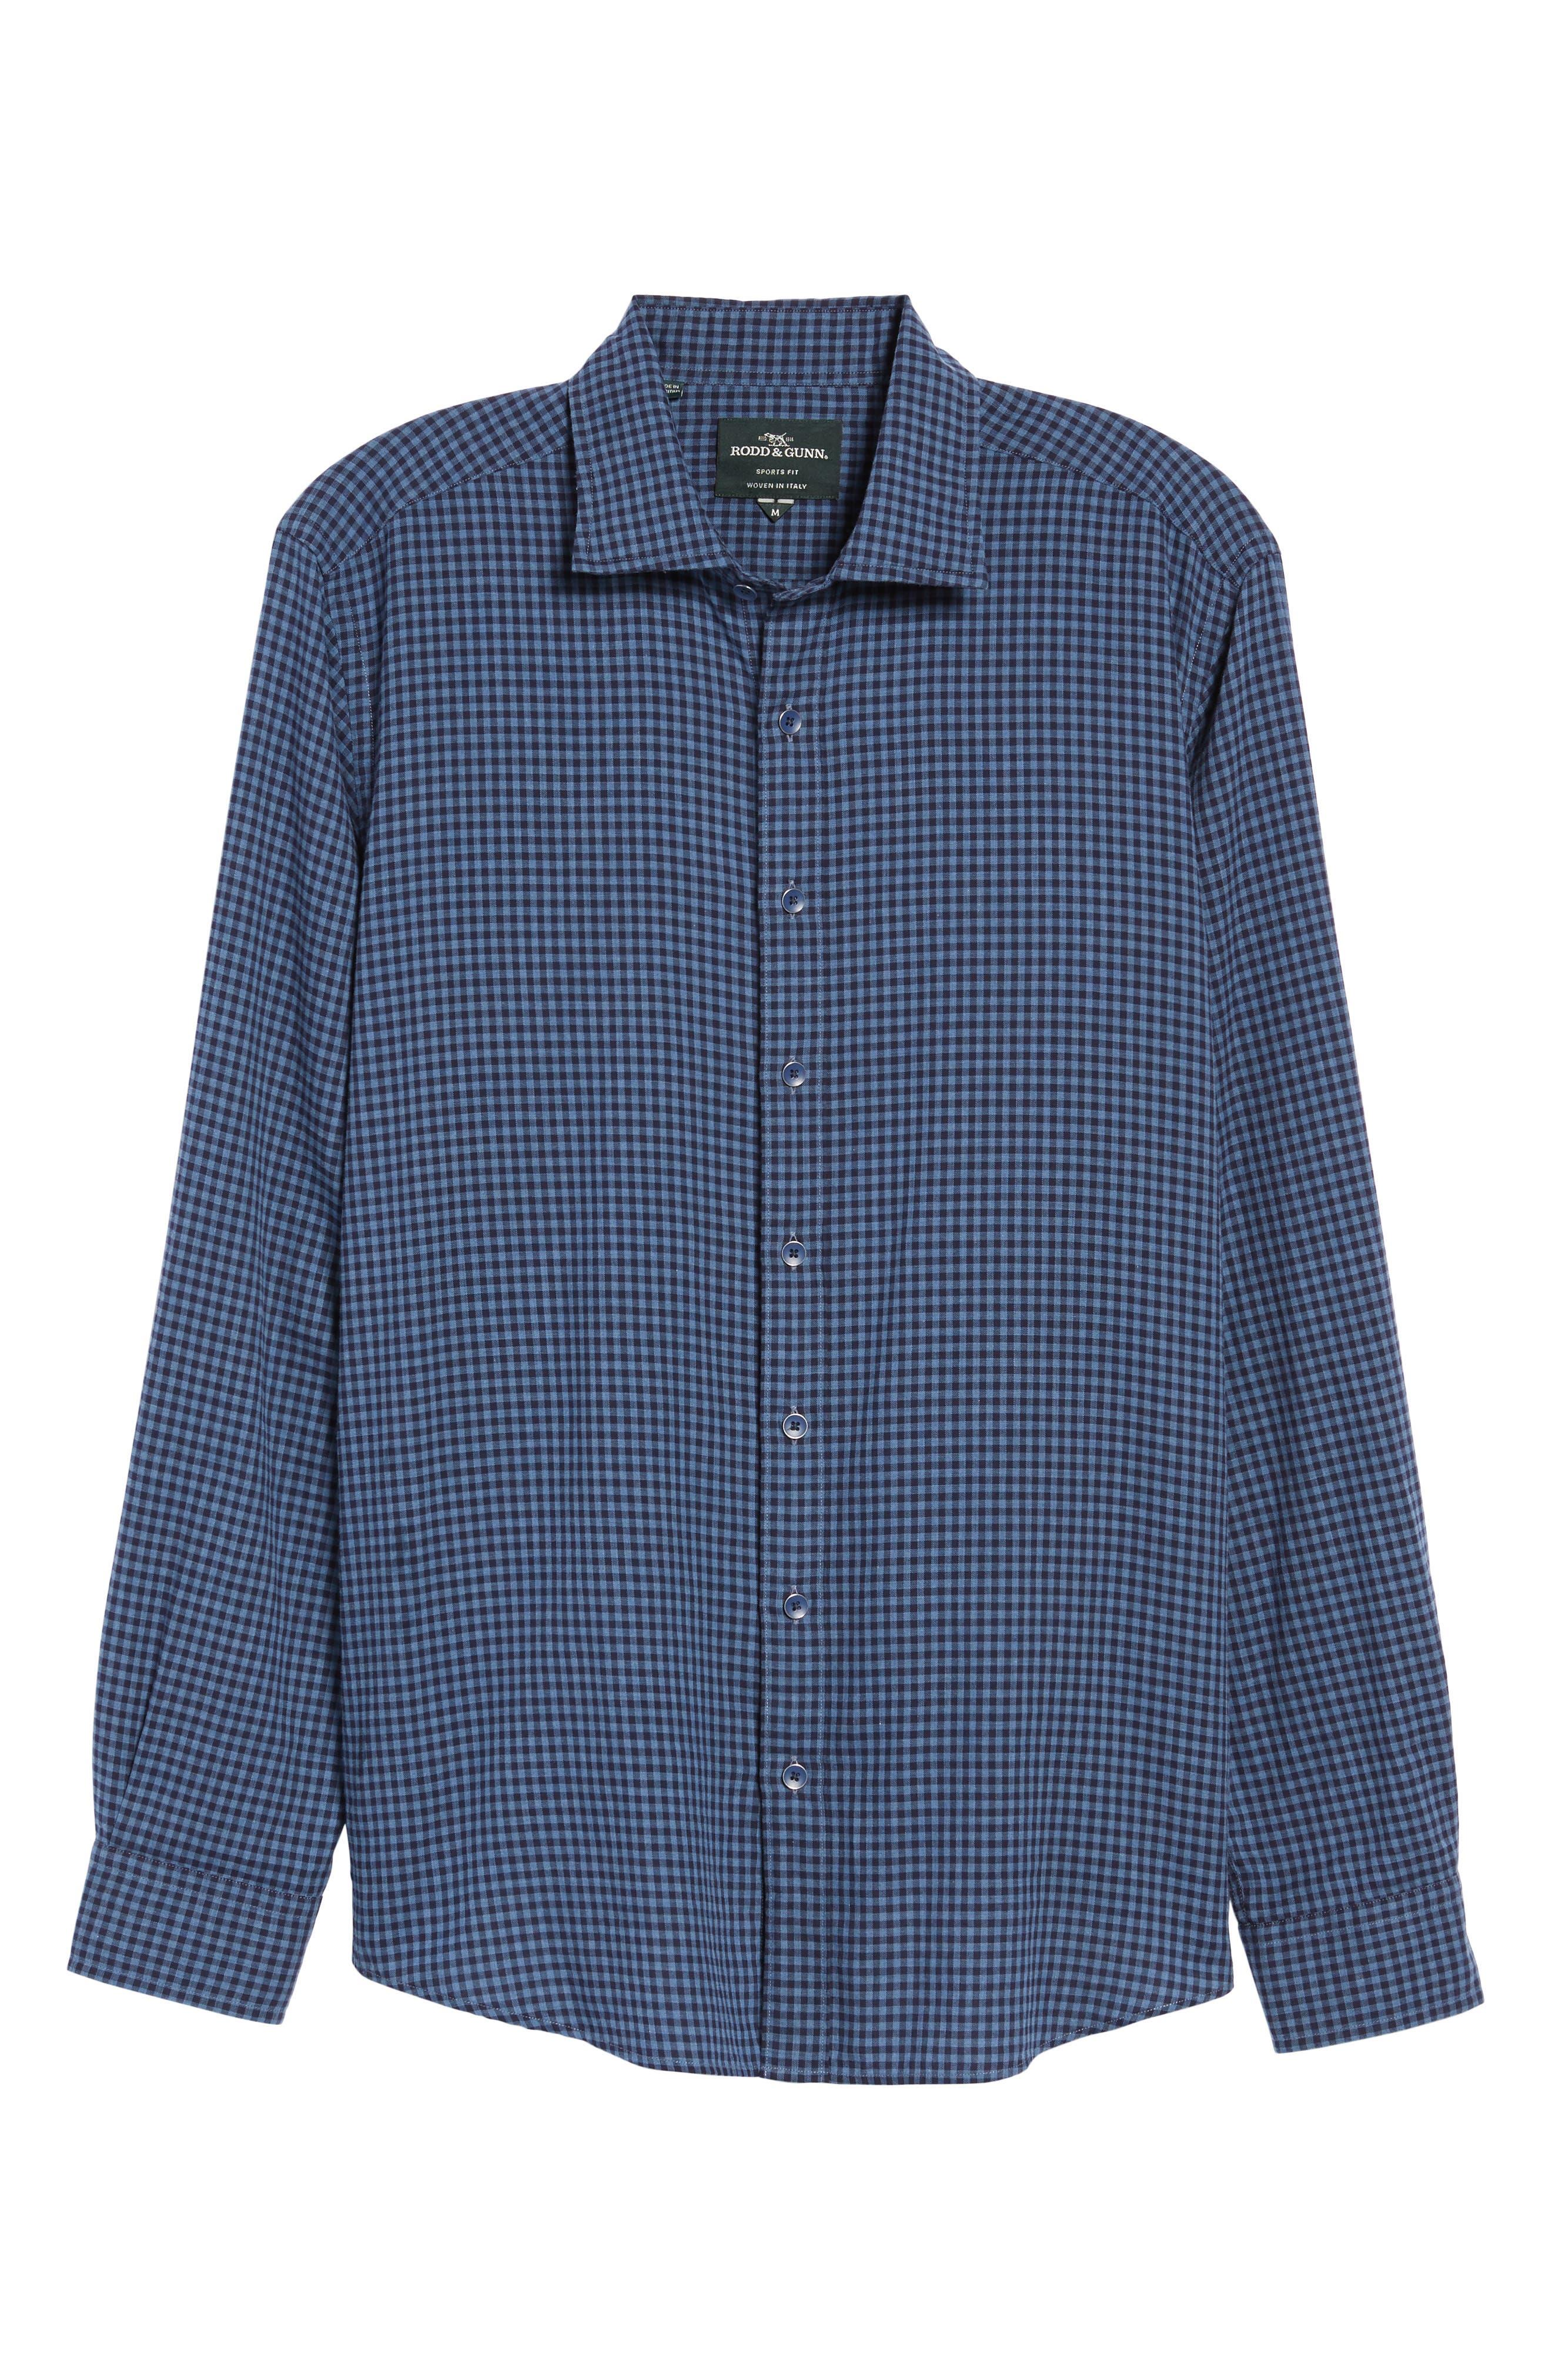 Kennington Regular Fit Gingham Sport Shirt,                             Alternate thumbnail 6, color,                             401